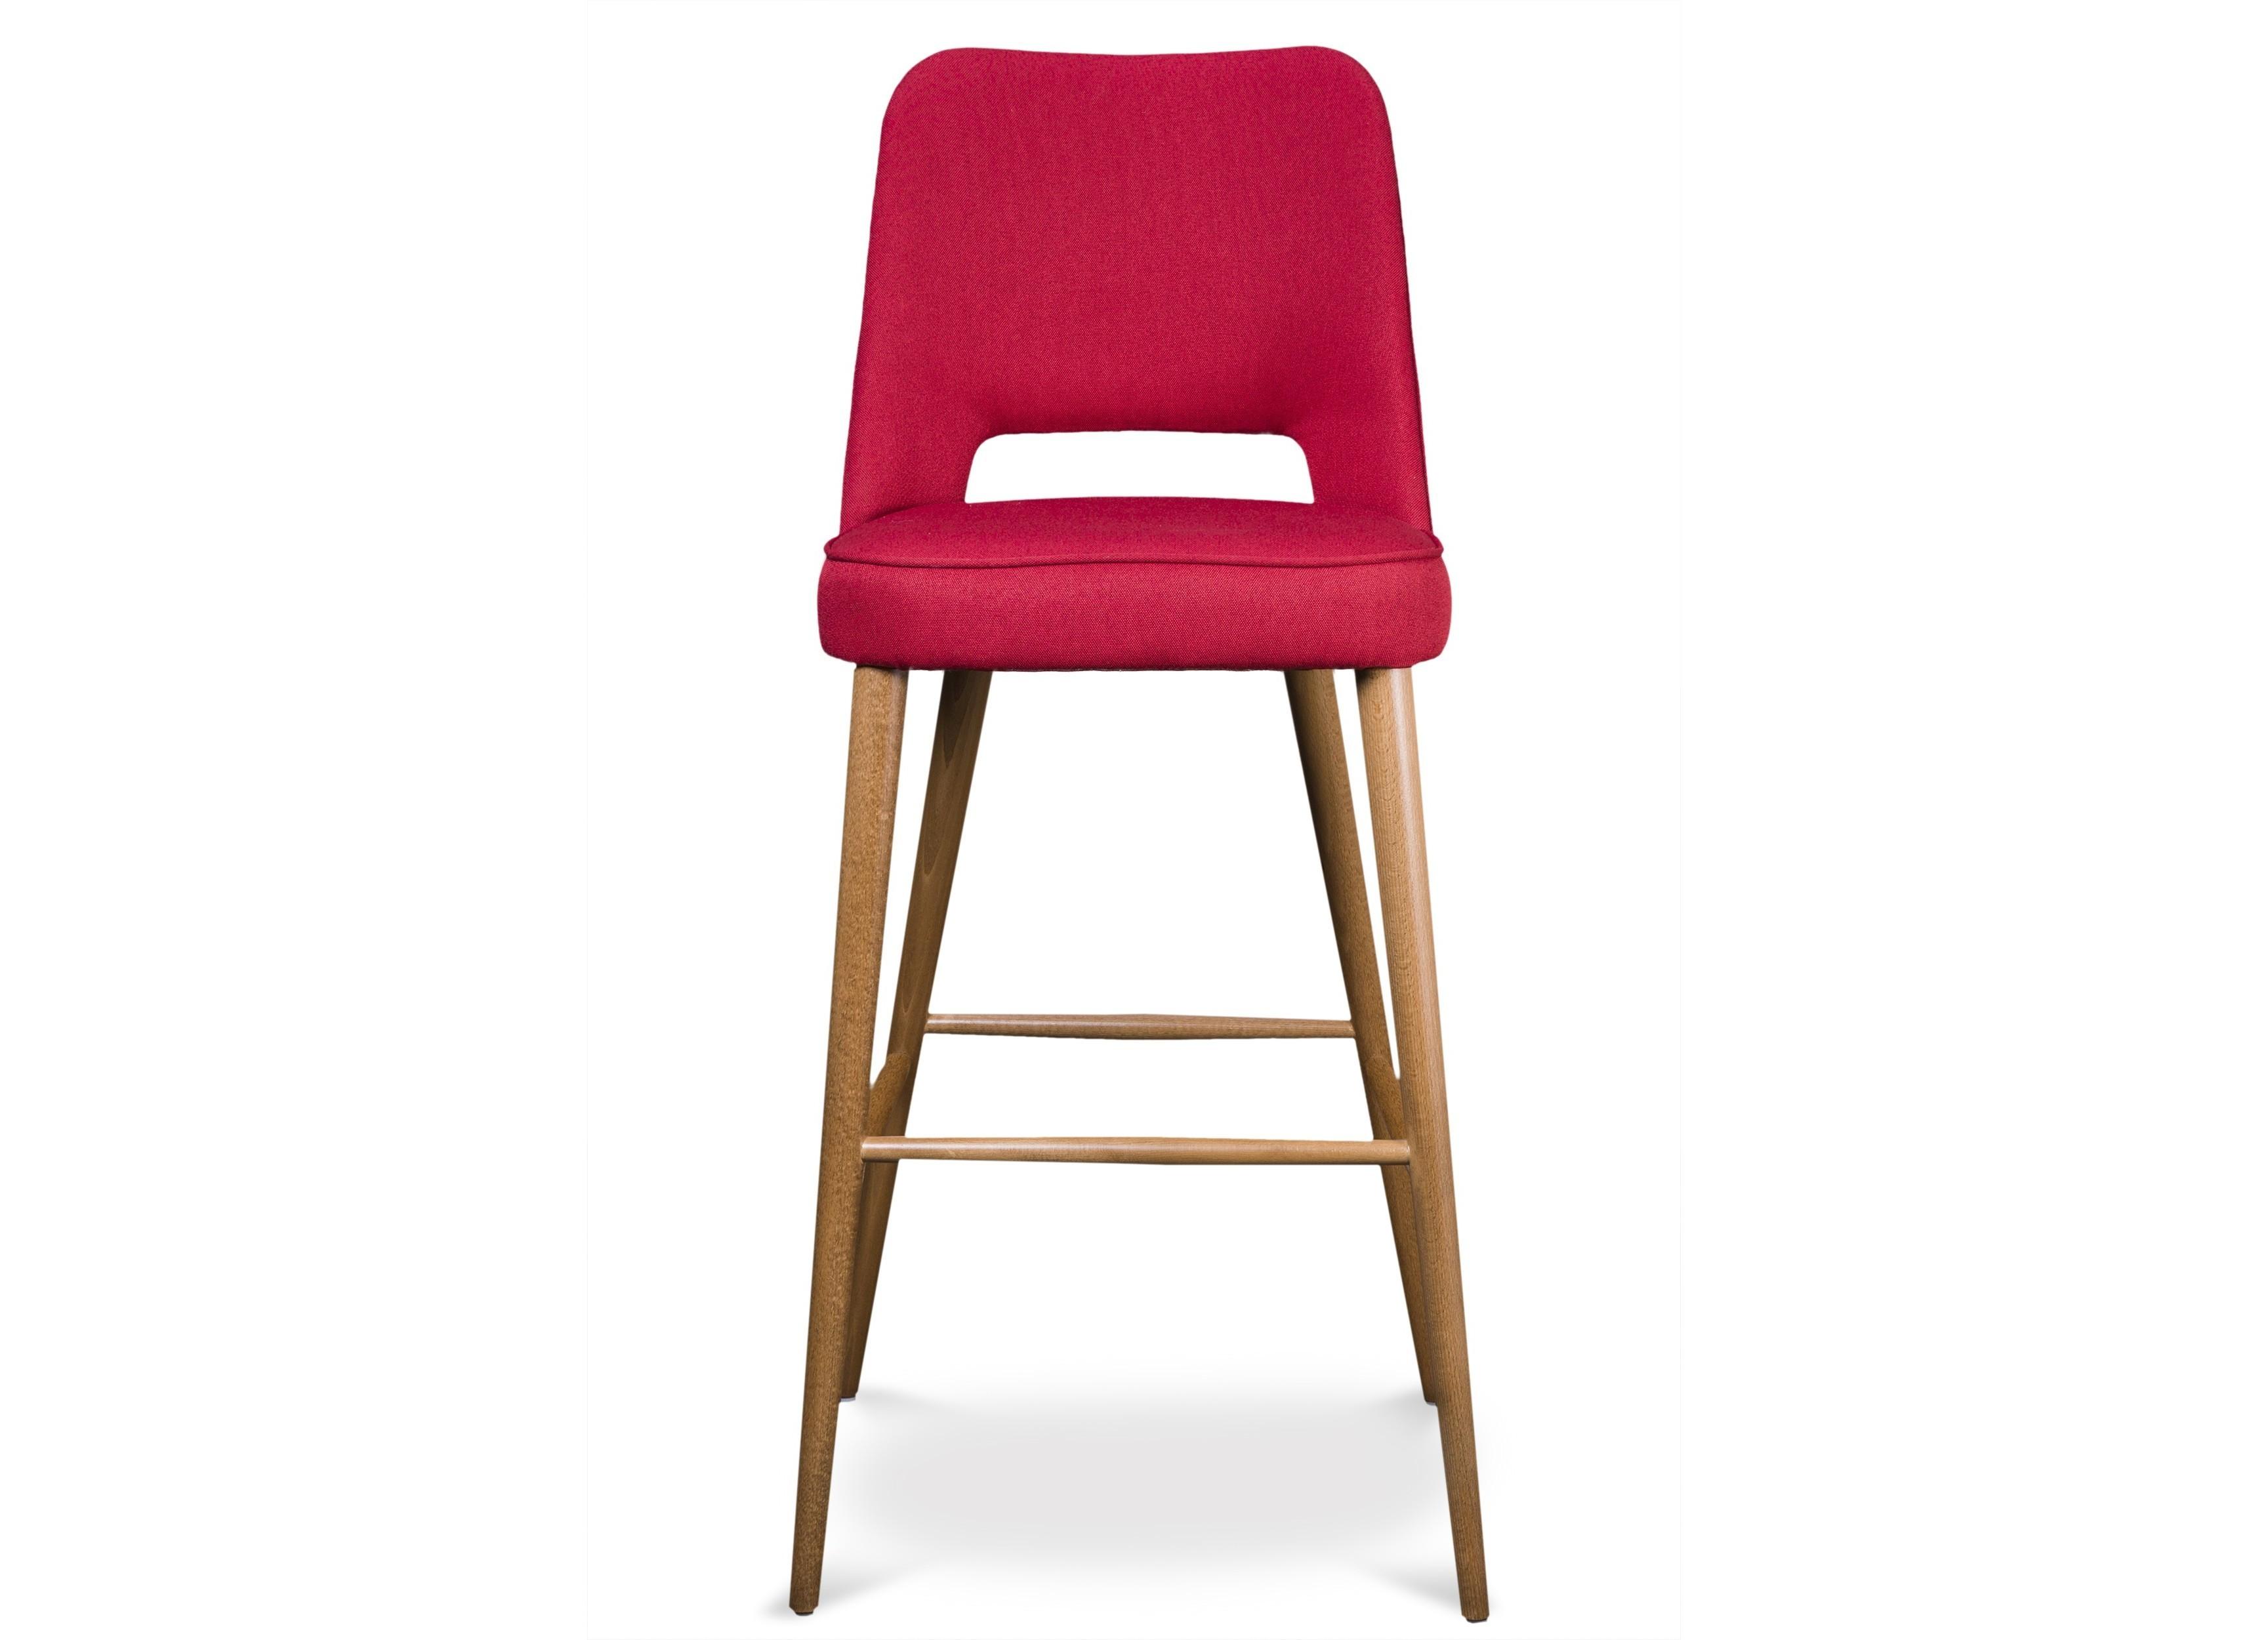 Комплект из 4 стульев aksel (myfurnish) розовый 47x111x52 см. фото